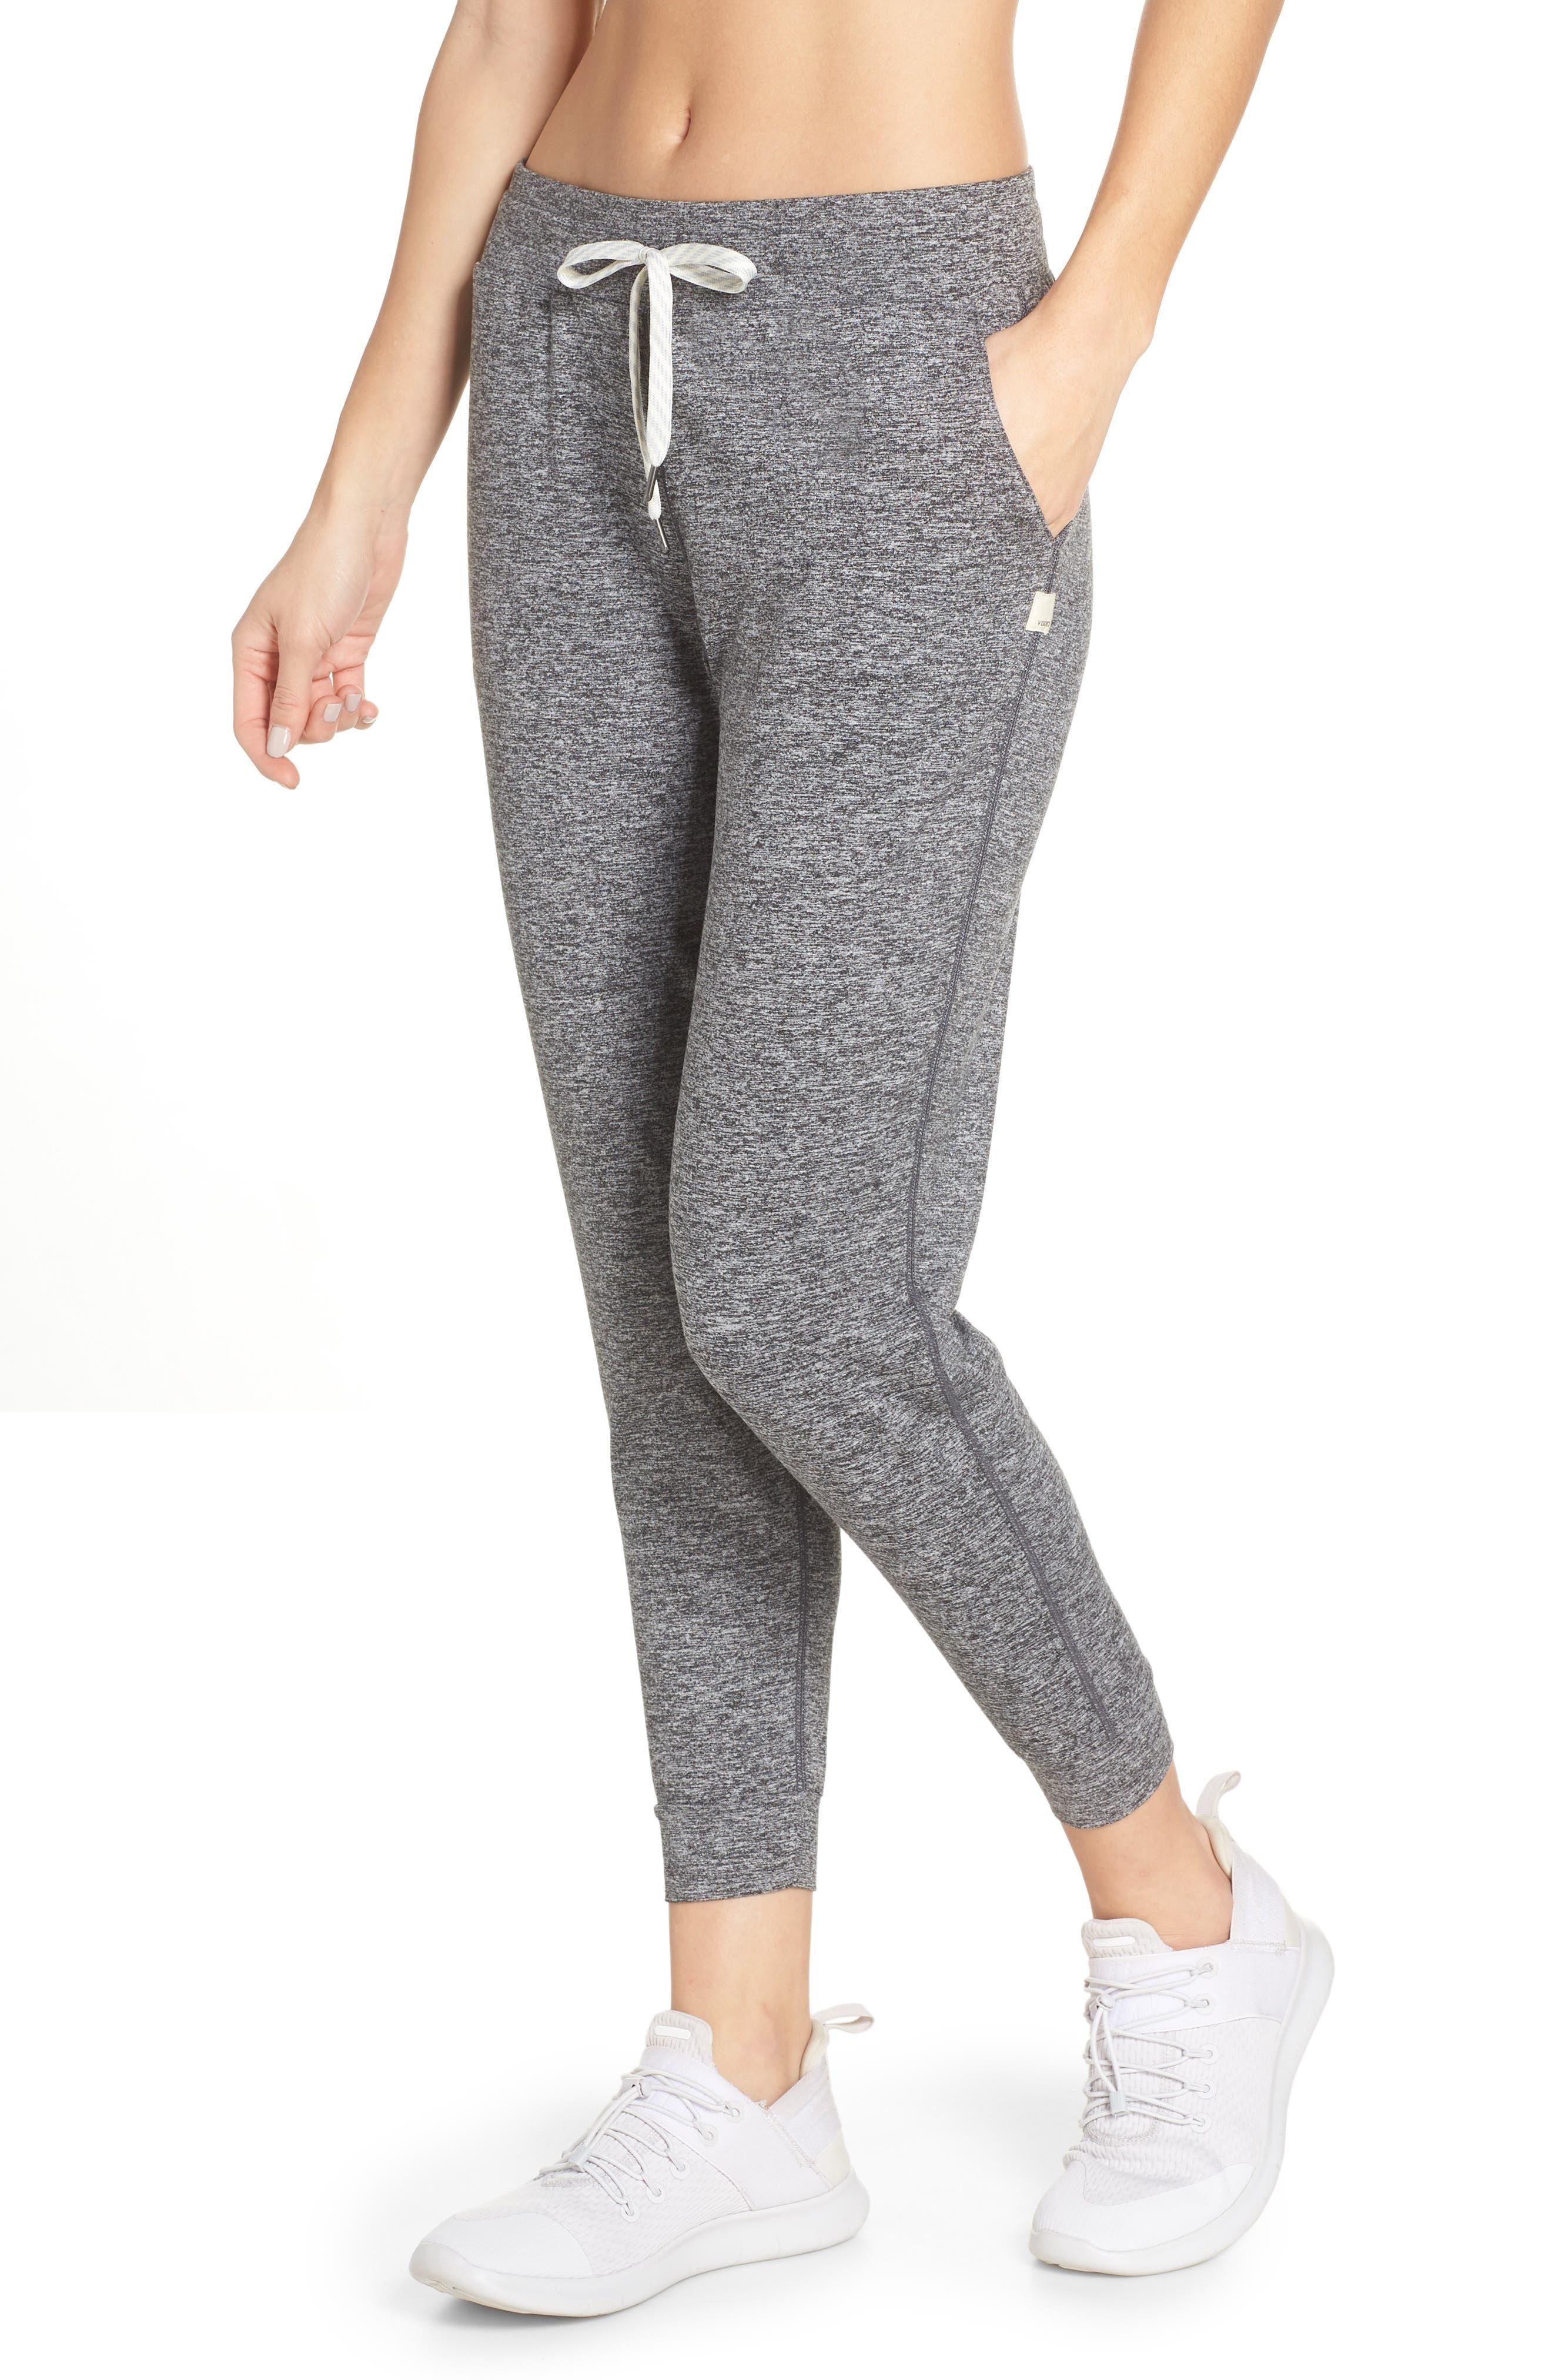 Vuori Performance Joggers, Grey